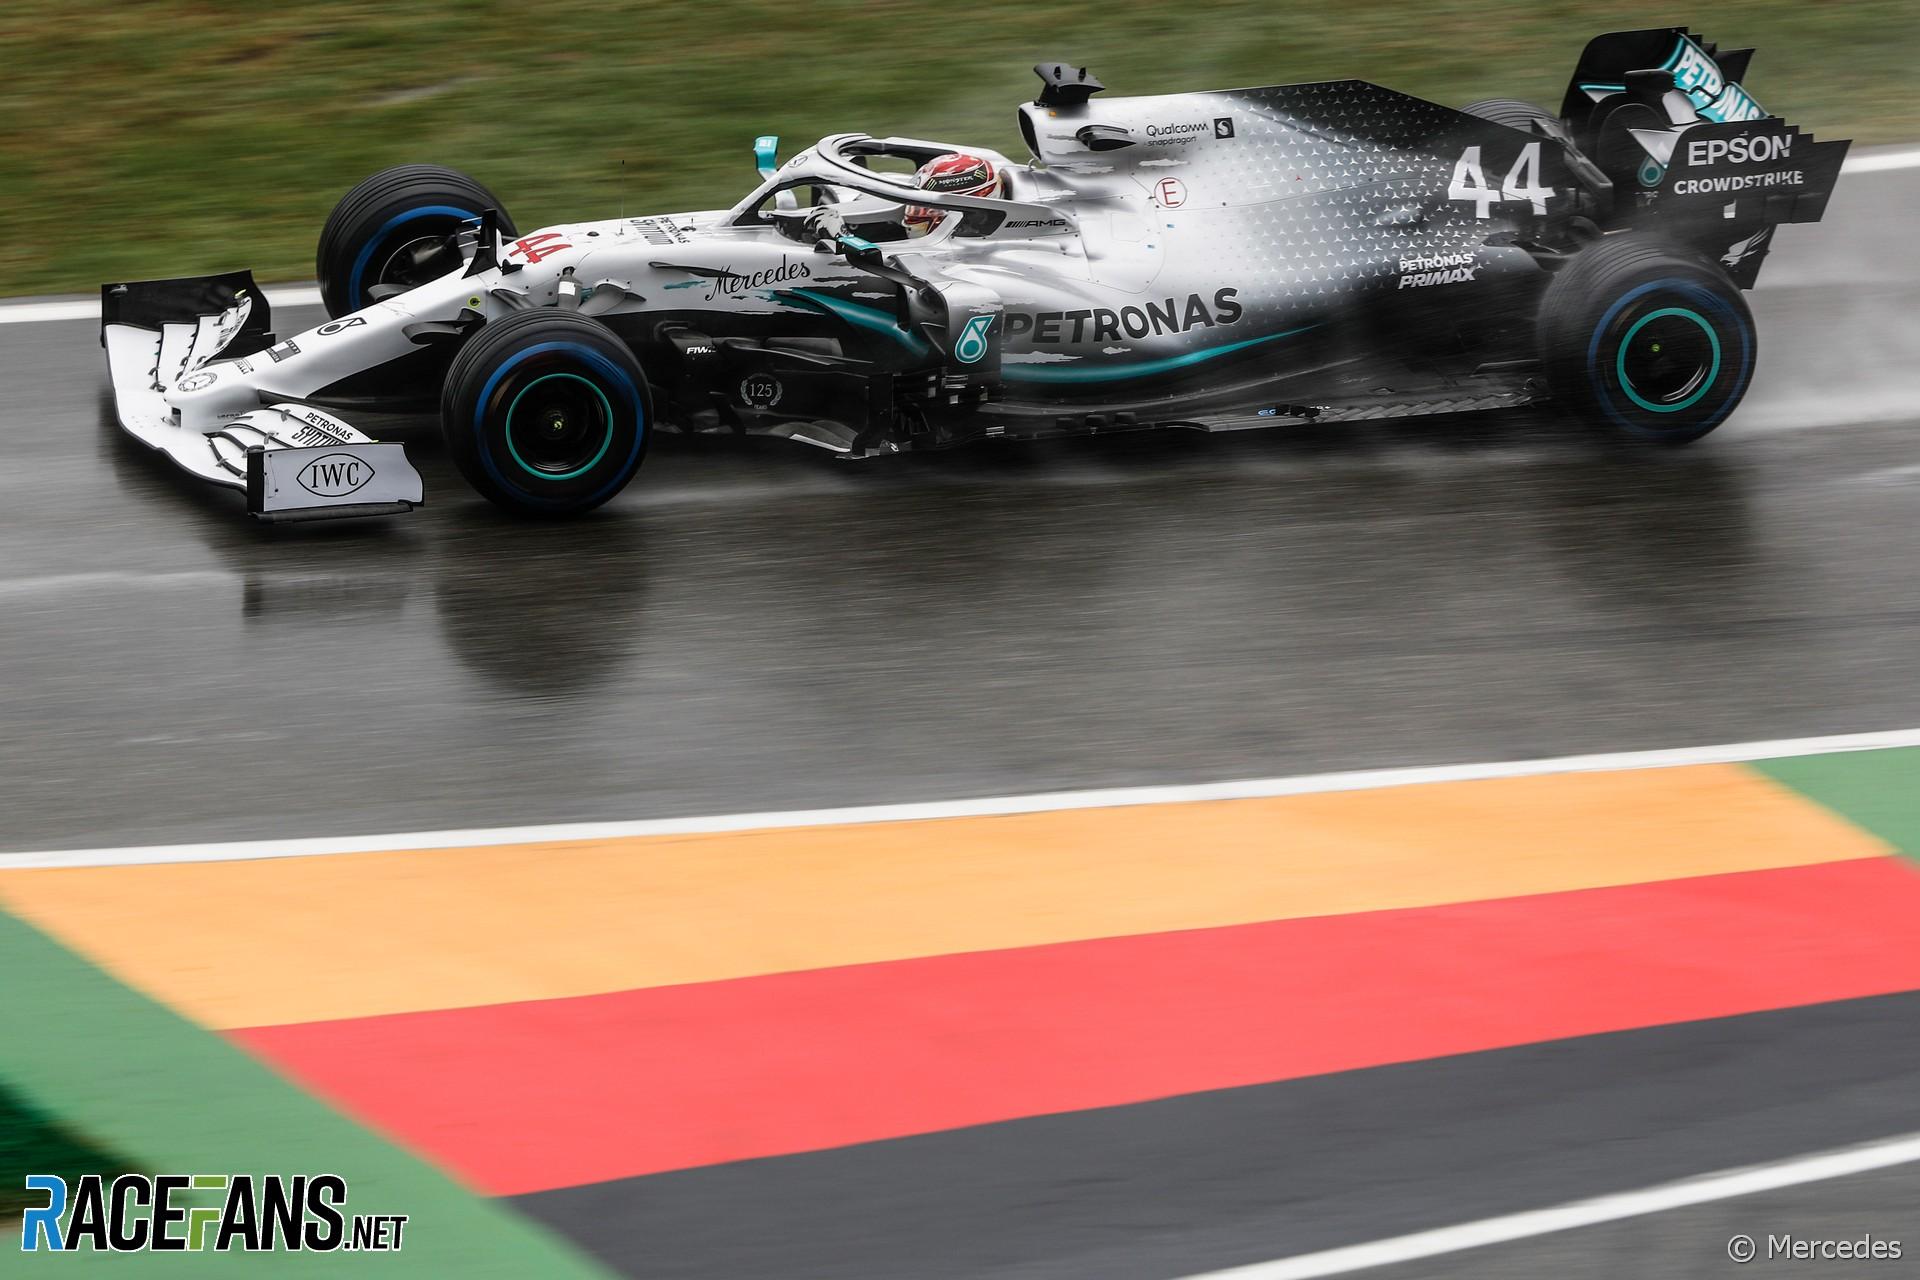 Lewis Hamilton, Mercedes, Hockenheimring, 2019